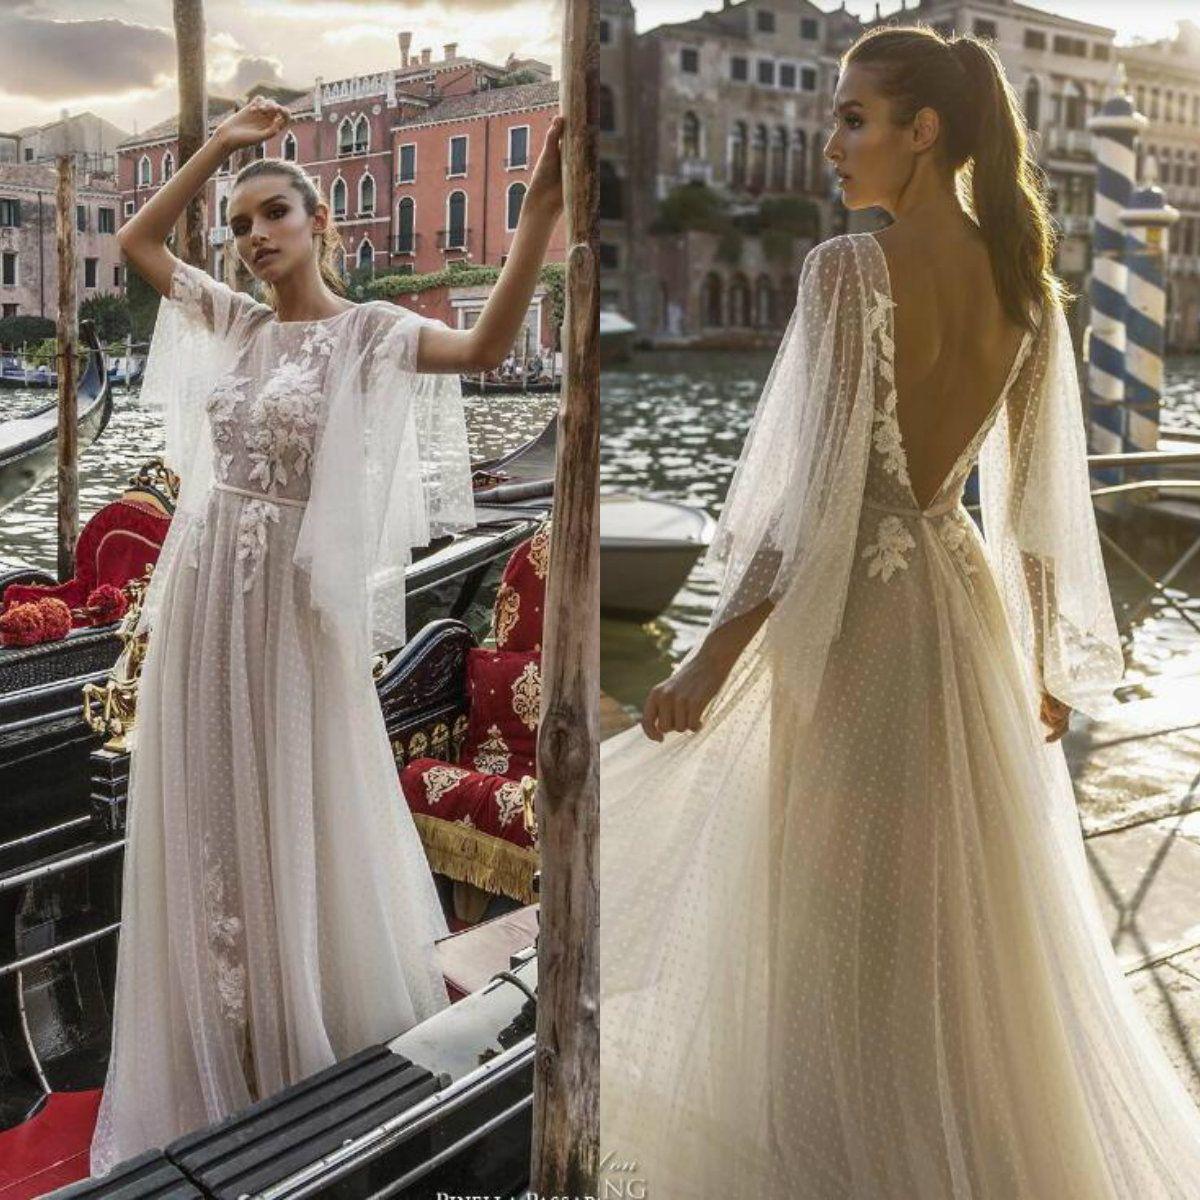 54534932de Pinella Passaro 2019 Vintage Wedding Dresses Backless Long Sleeve ...